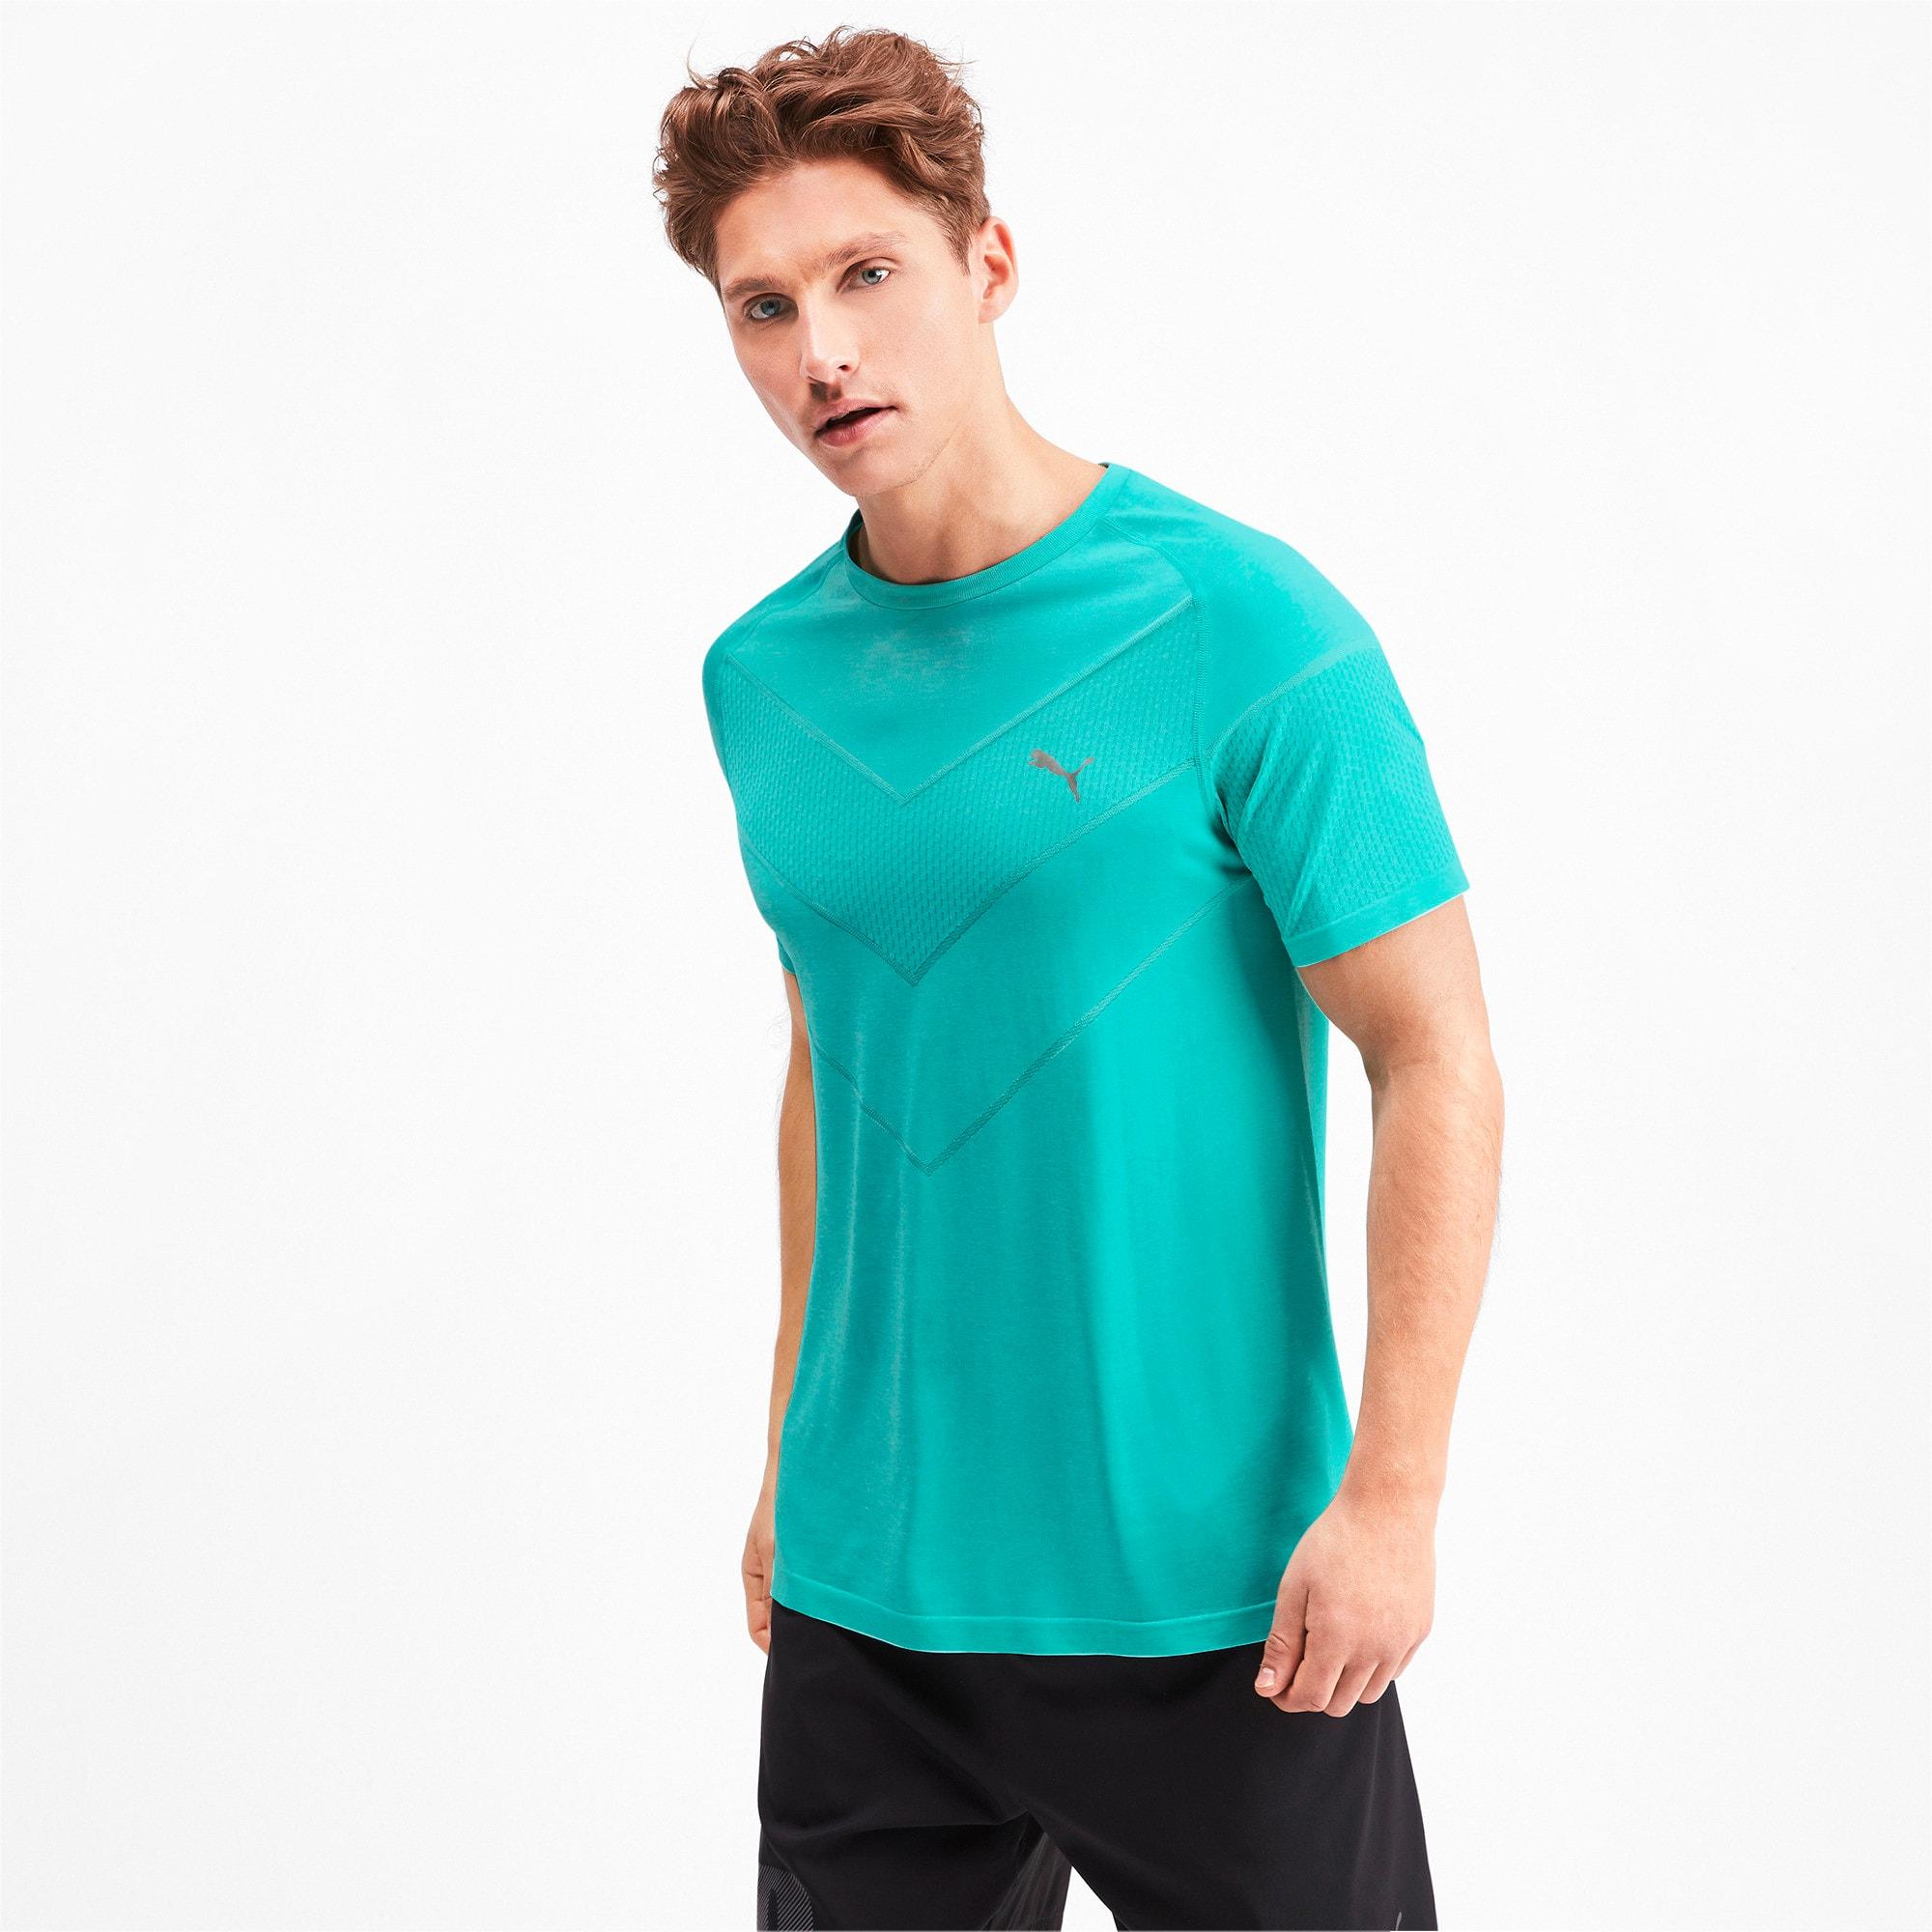 Thumbnail 1 of Reactive evoKNIT Herren T-Shirt, Blue Turquoise Heather, medium